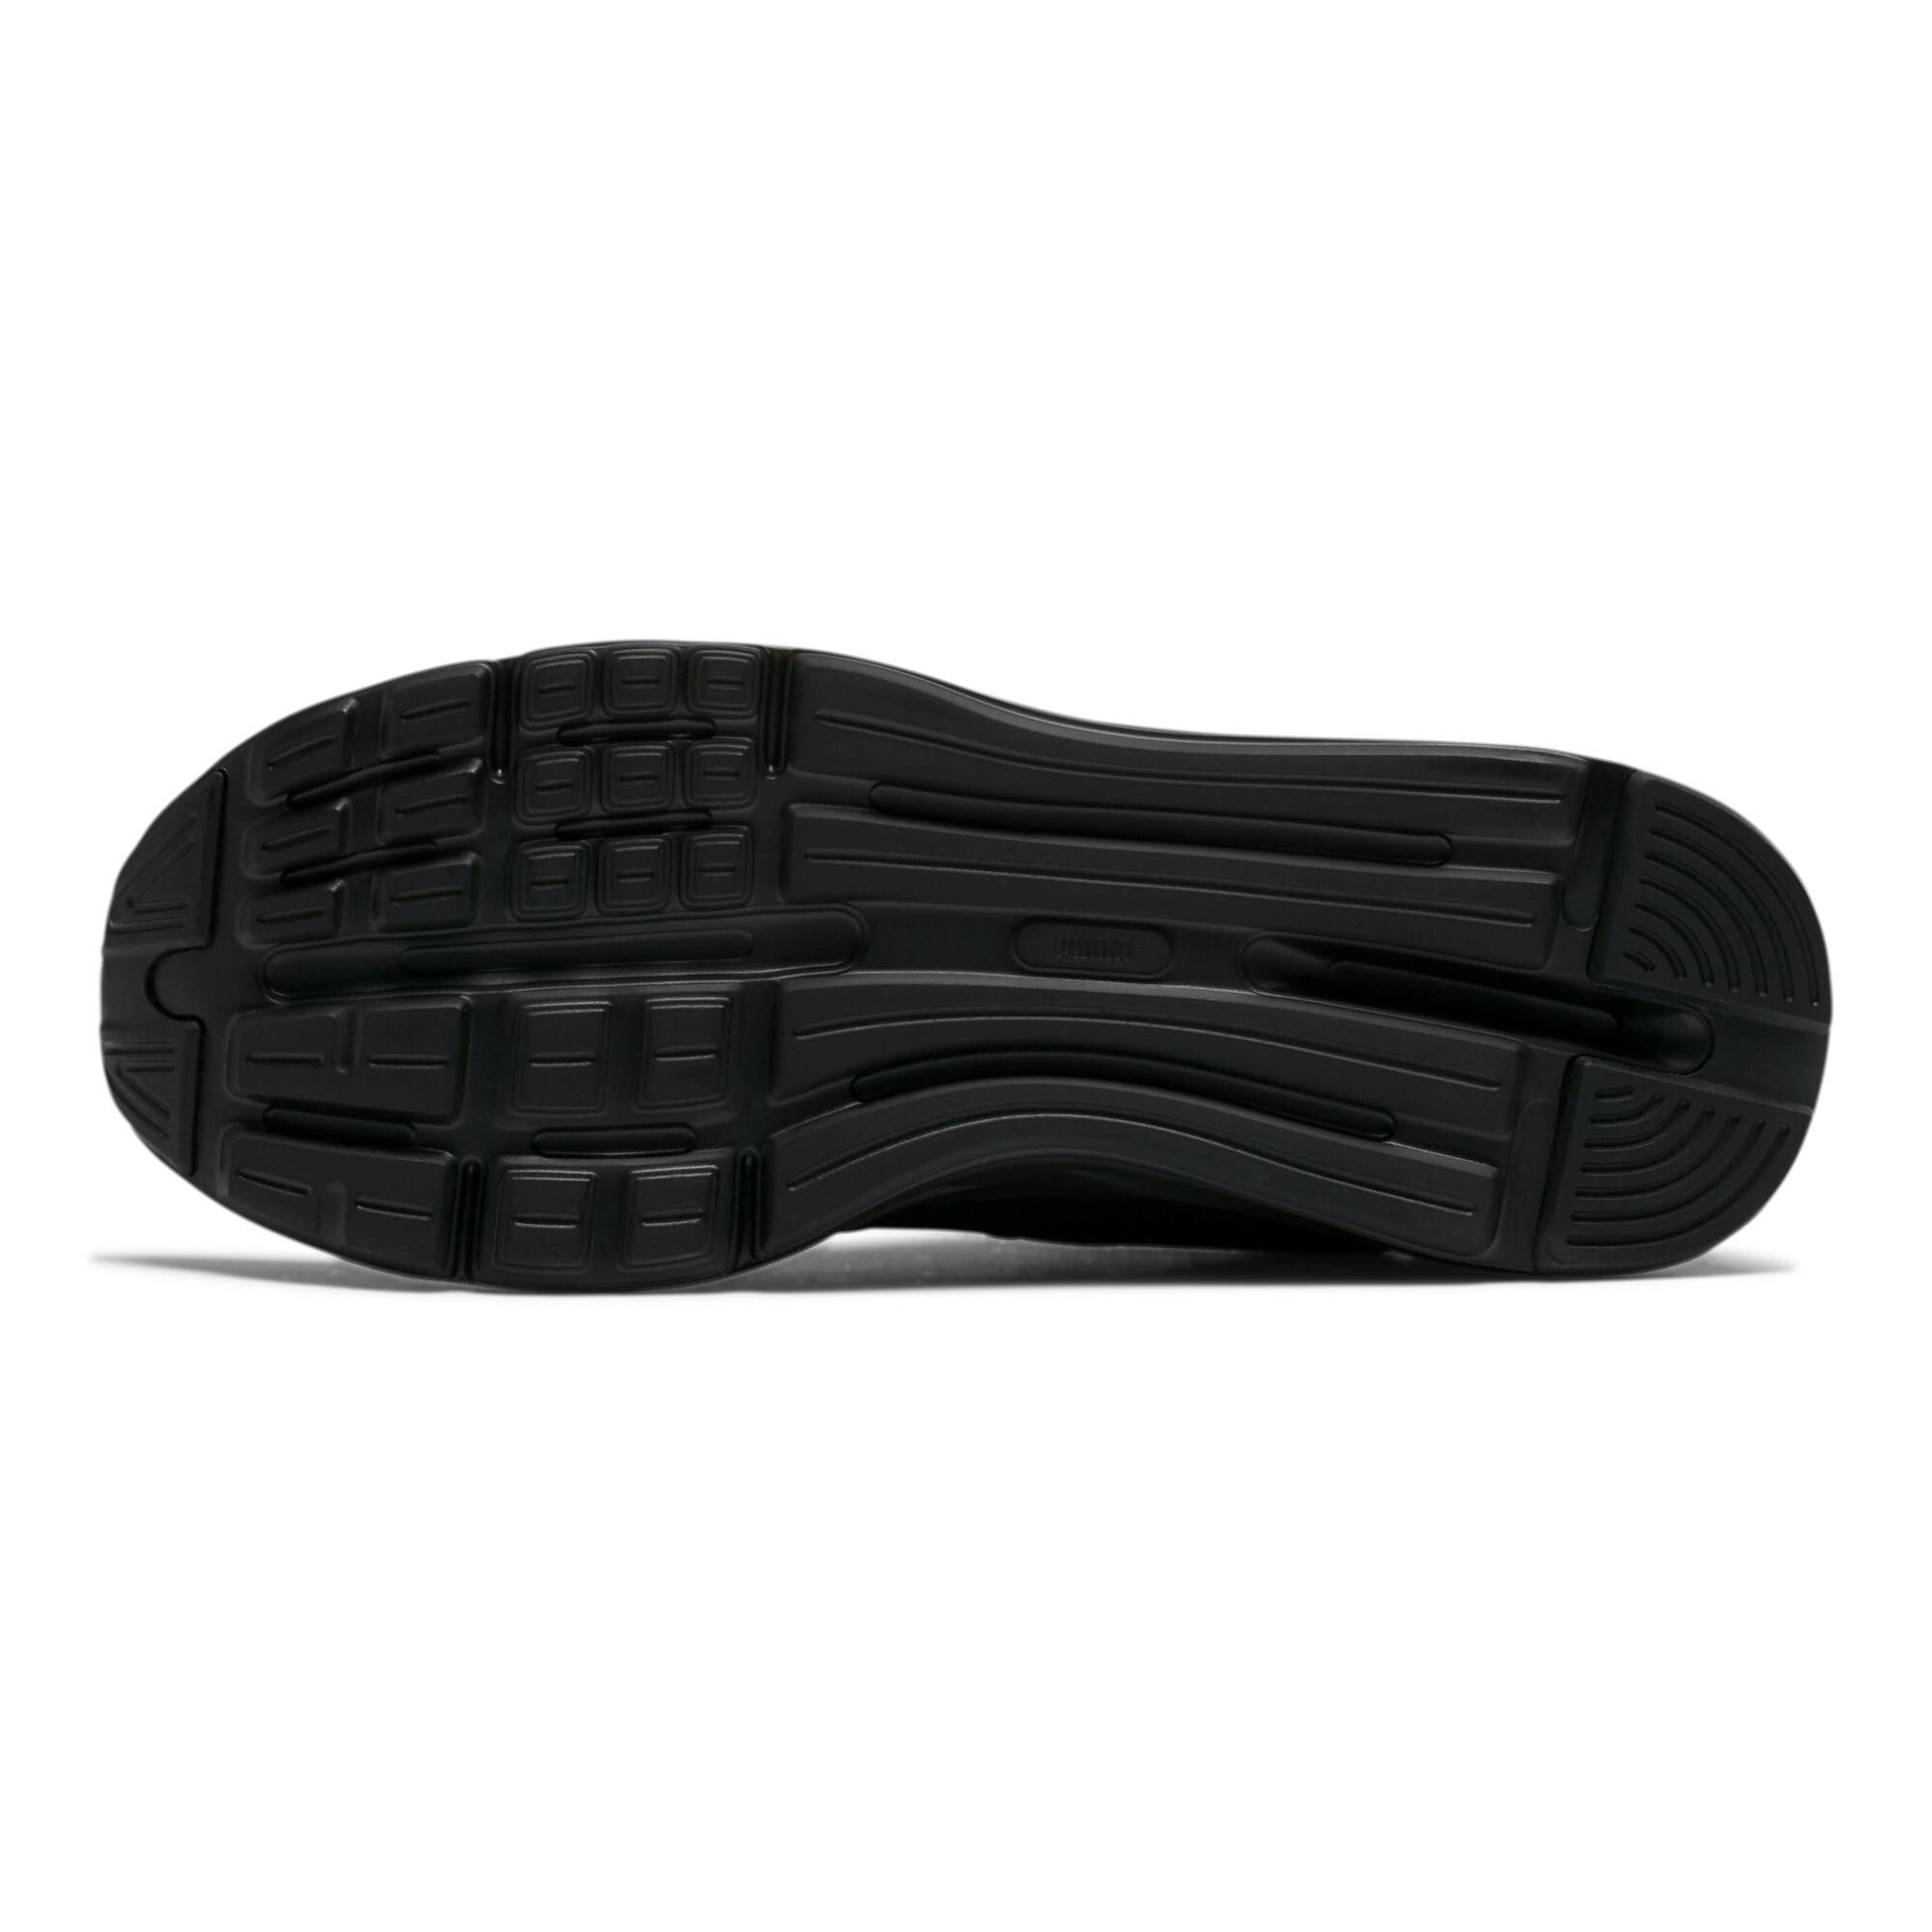 PUMA-Men-039-s-Enzo-Training-Shoes thumbnail 5